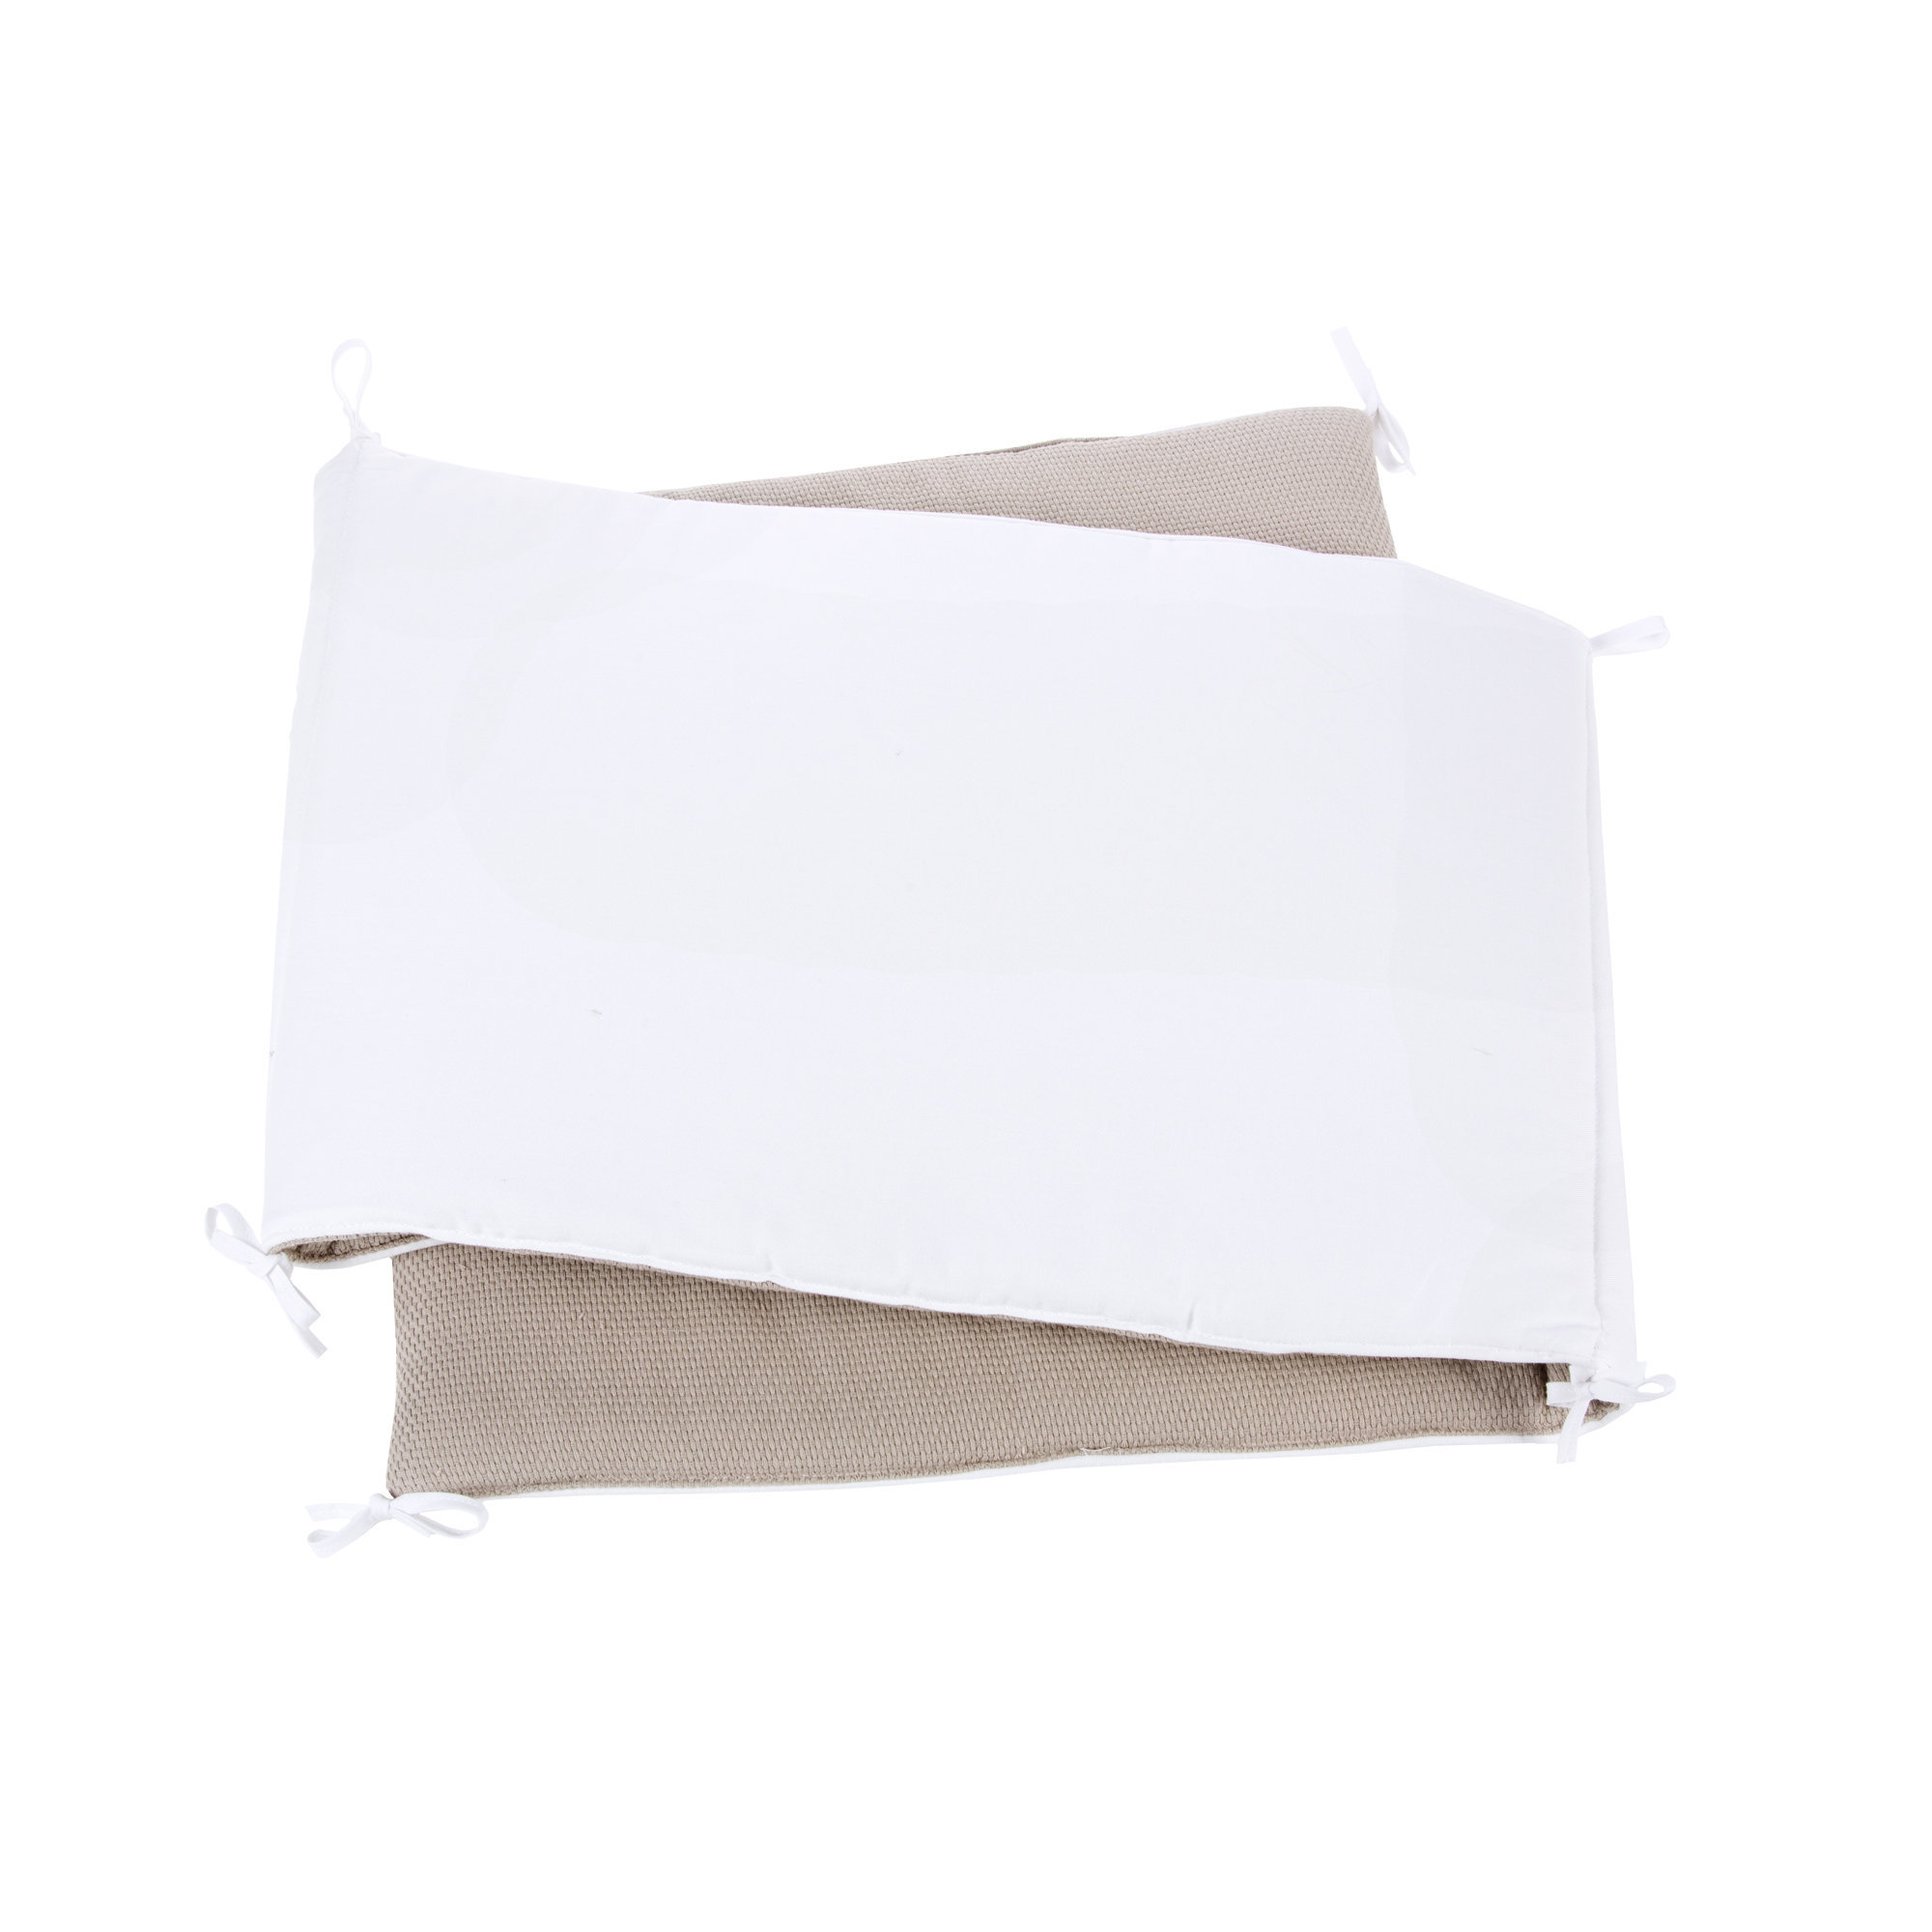 Protector cuna cama transformable 60x120 cm reversible con cintas de unión Arena